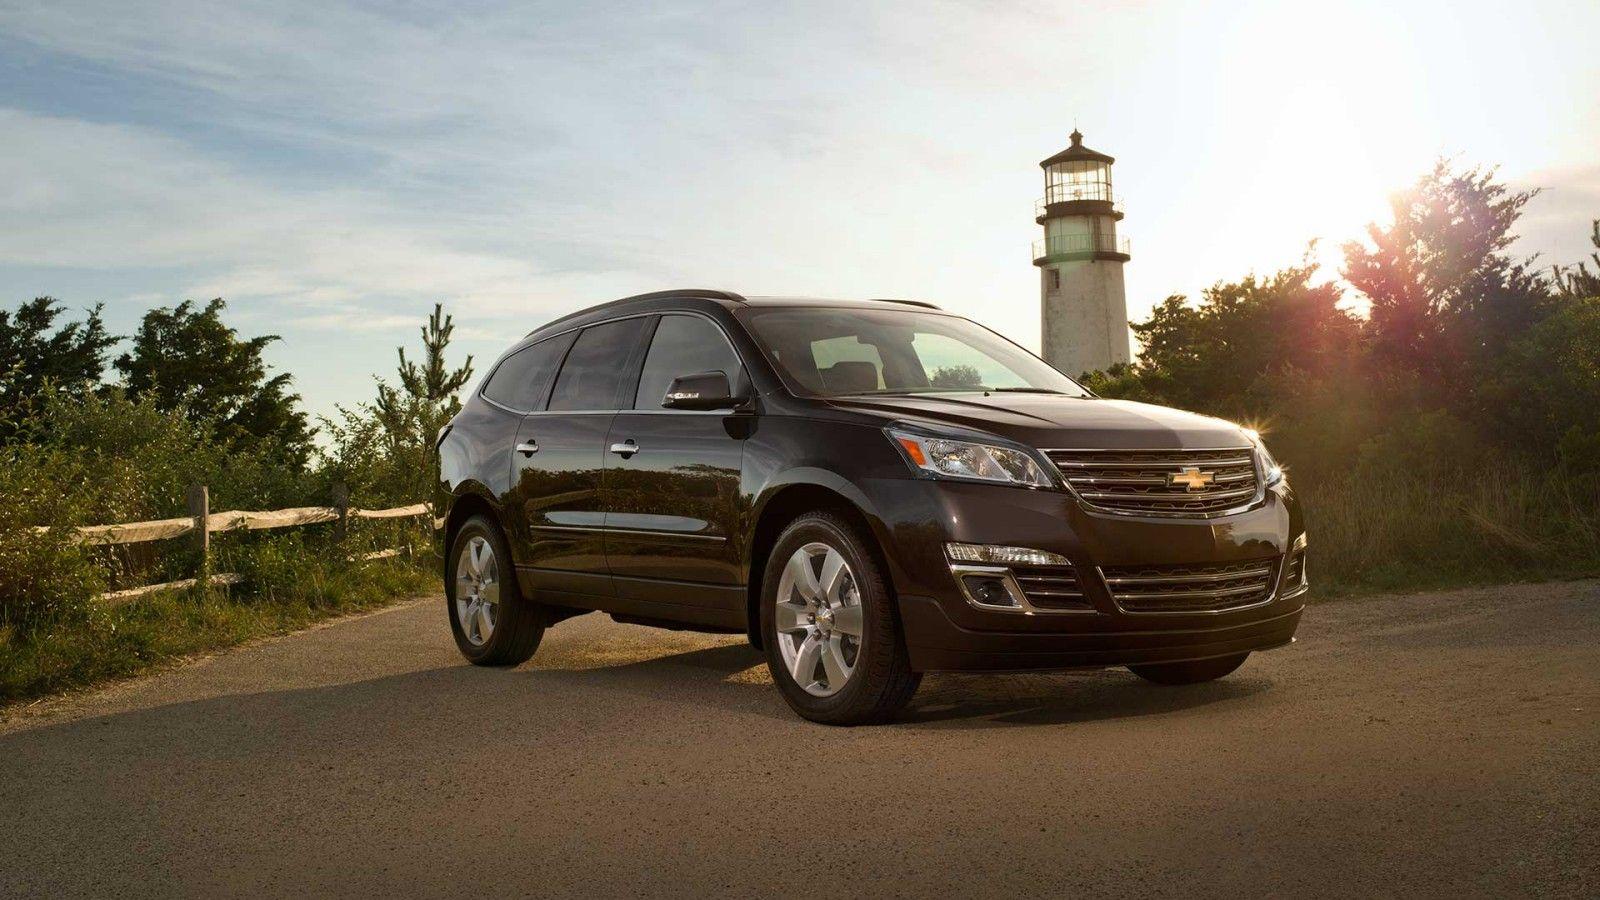 2014 Traverse Crossover Suv Exterior Photos Chevrolet